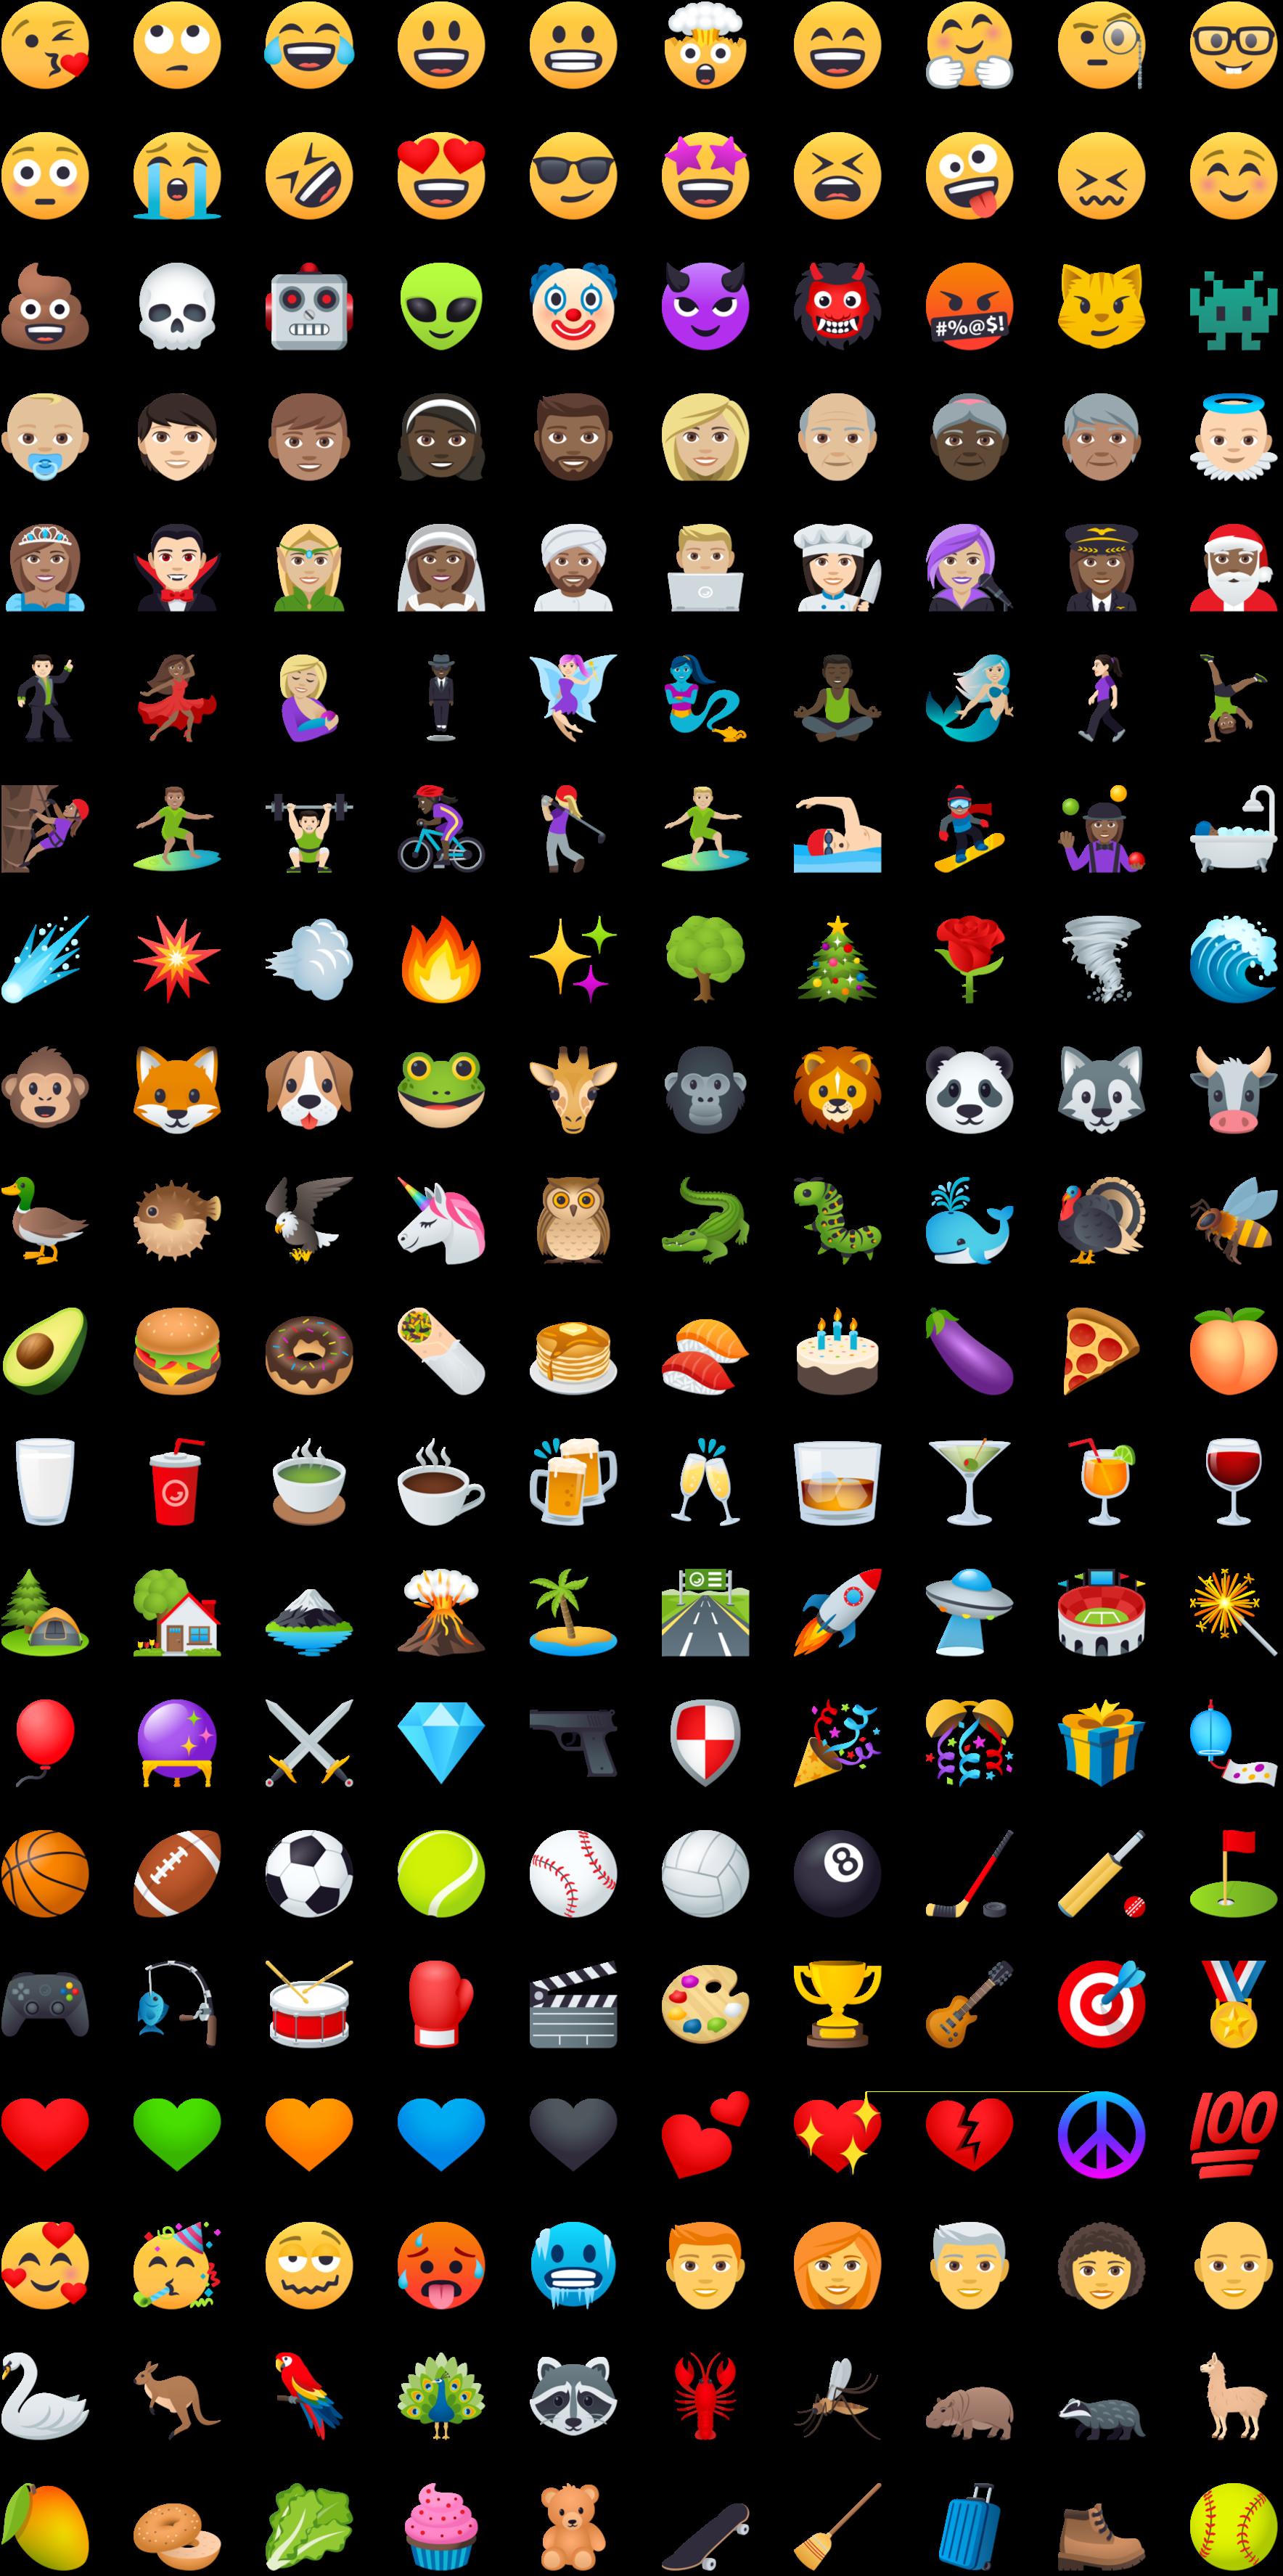 Apple Emoji Vector Free Download at GetDrawings.com   Free ...